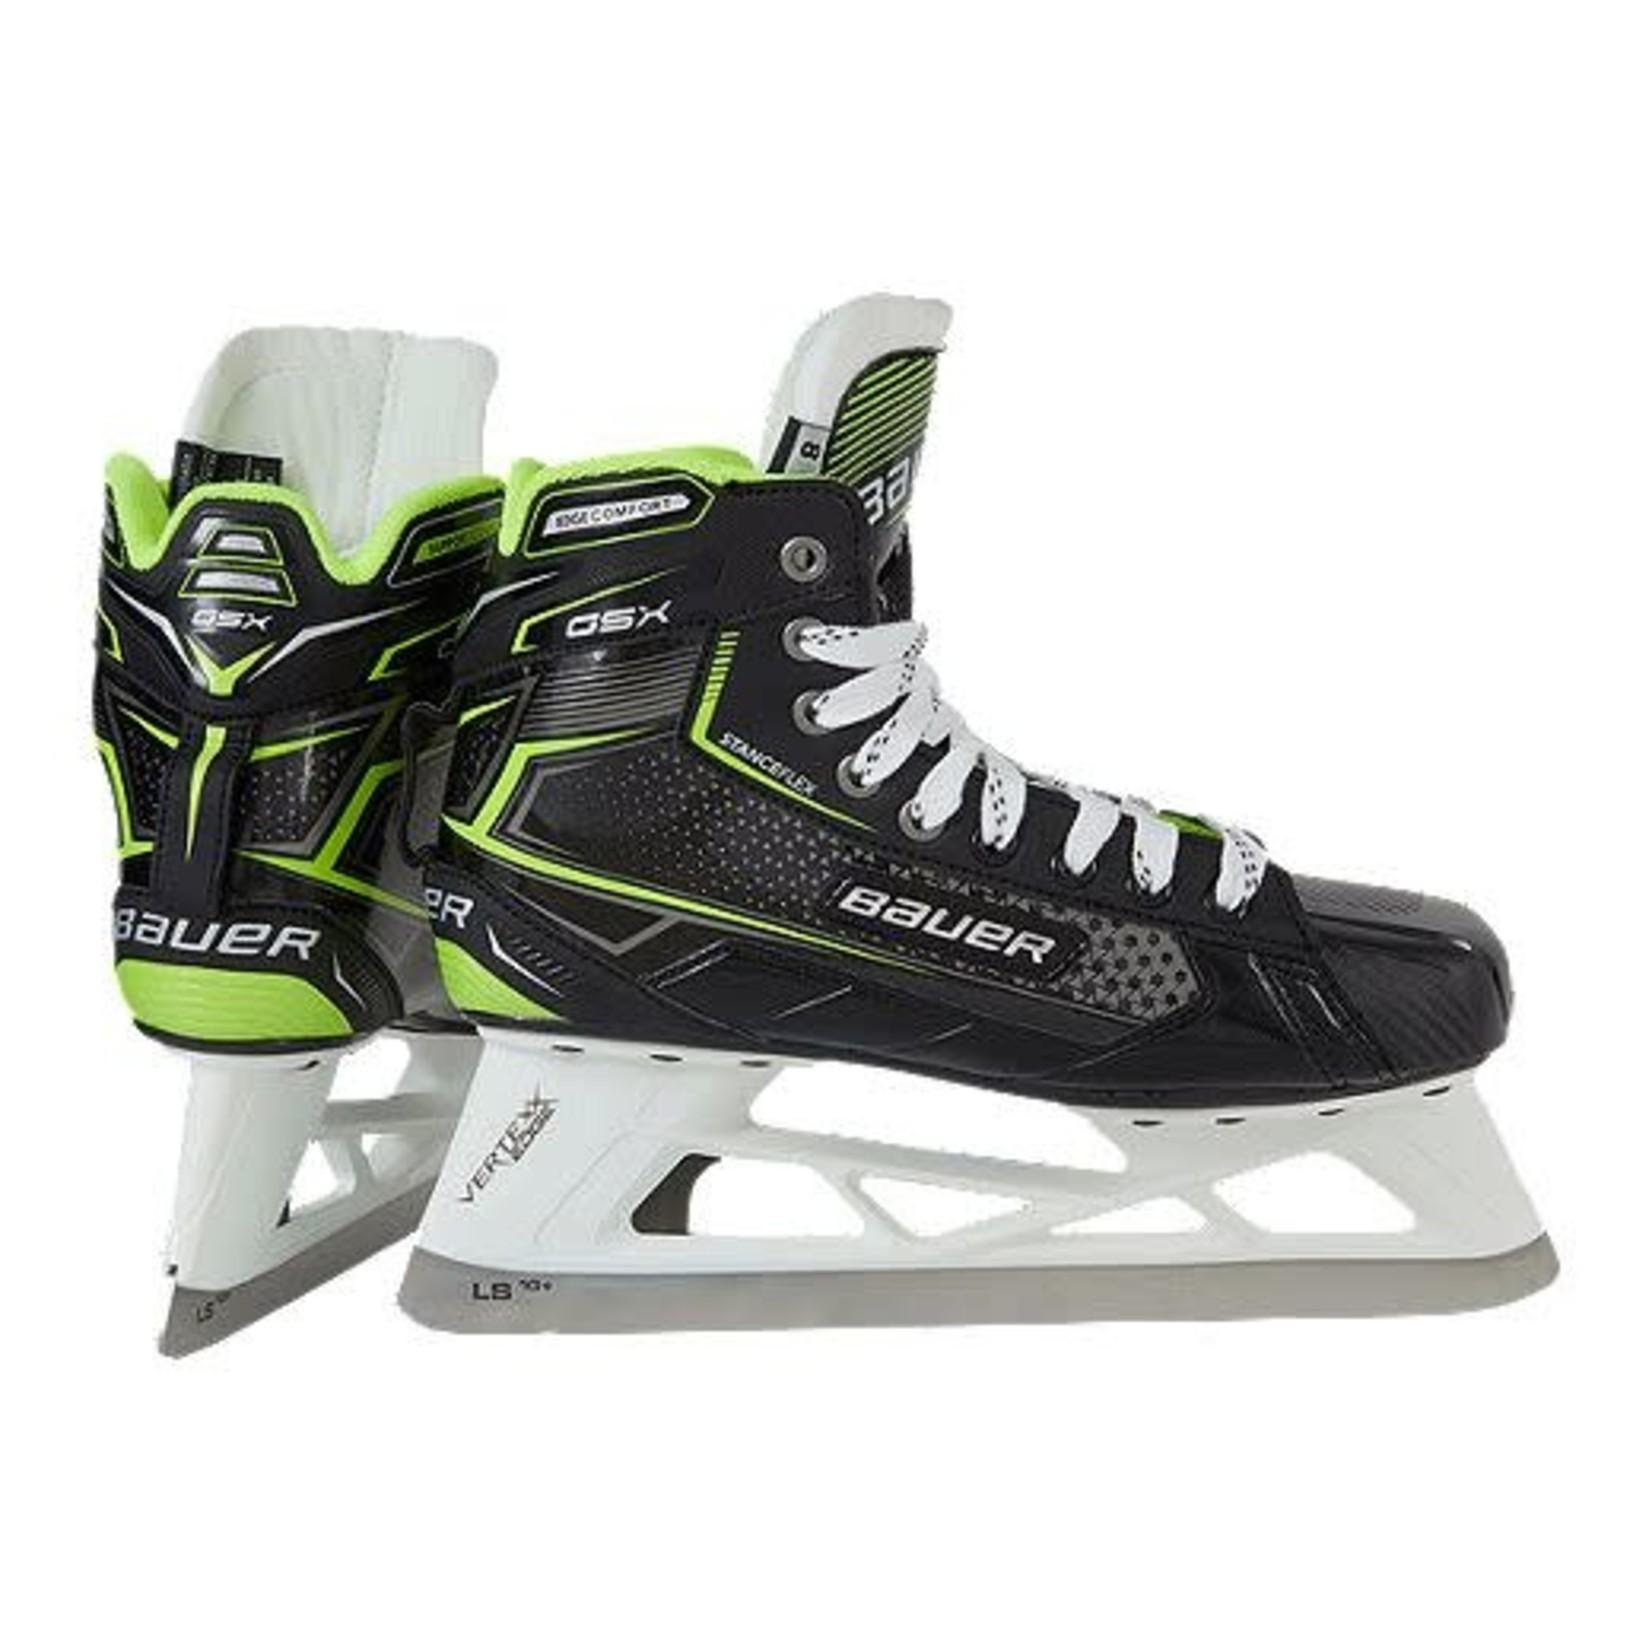 Bauer Bauer Hockey Goal Skates, GSX, Senior